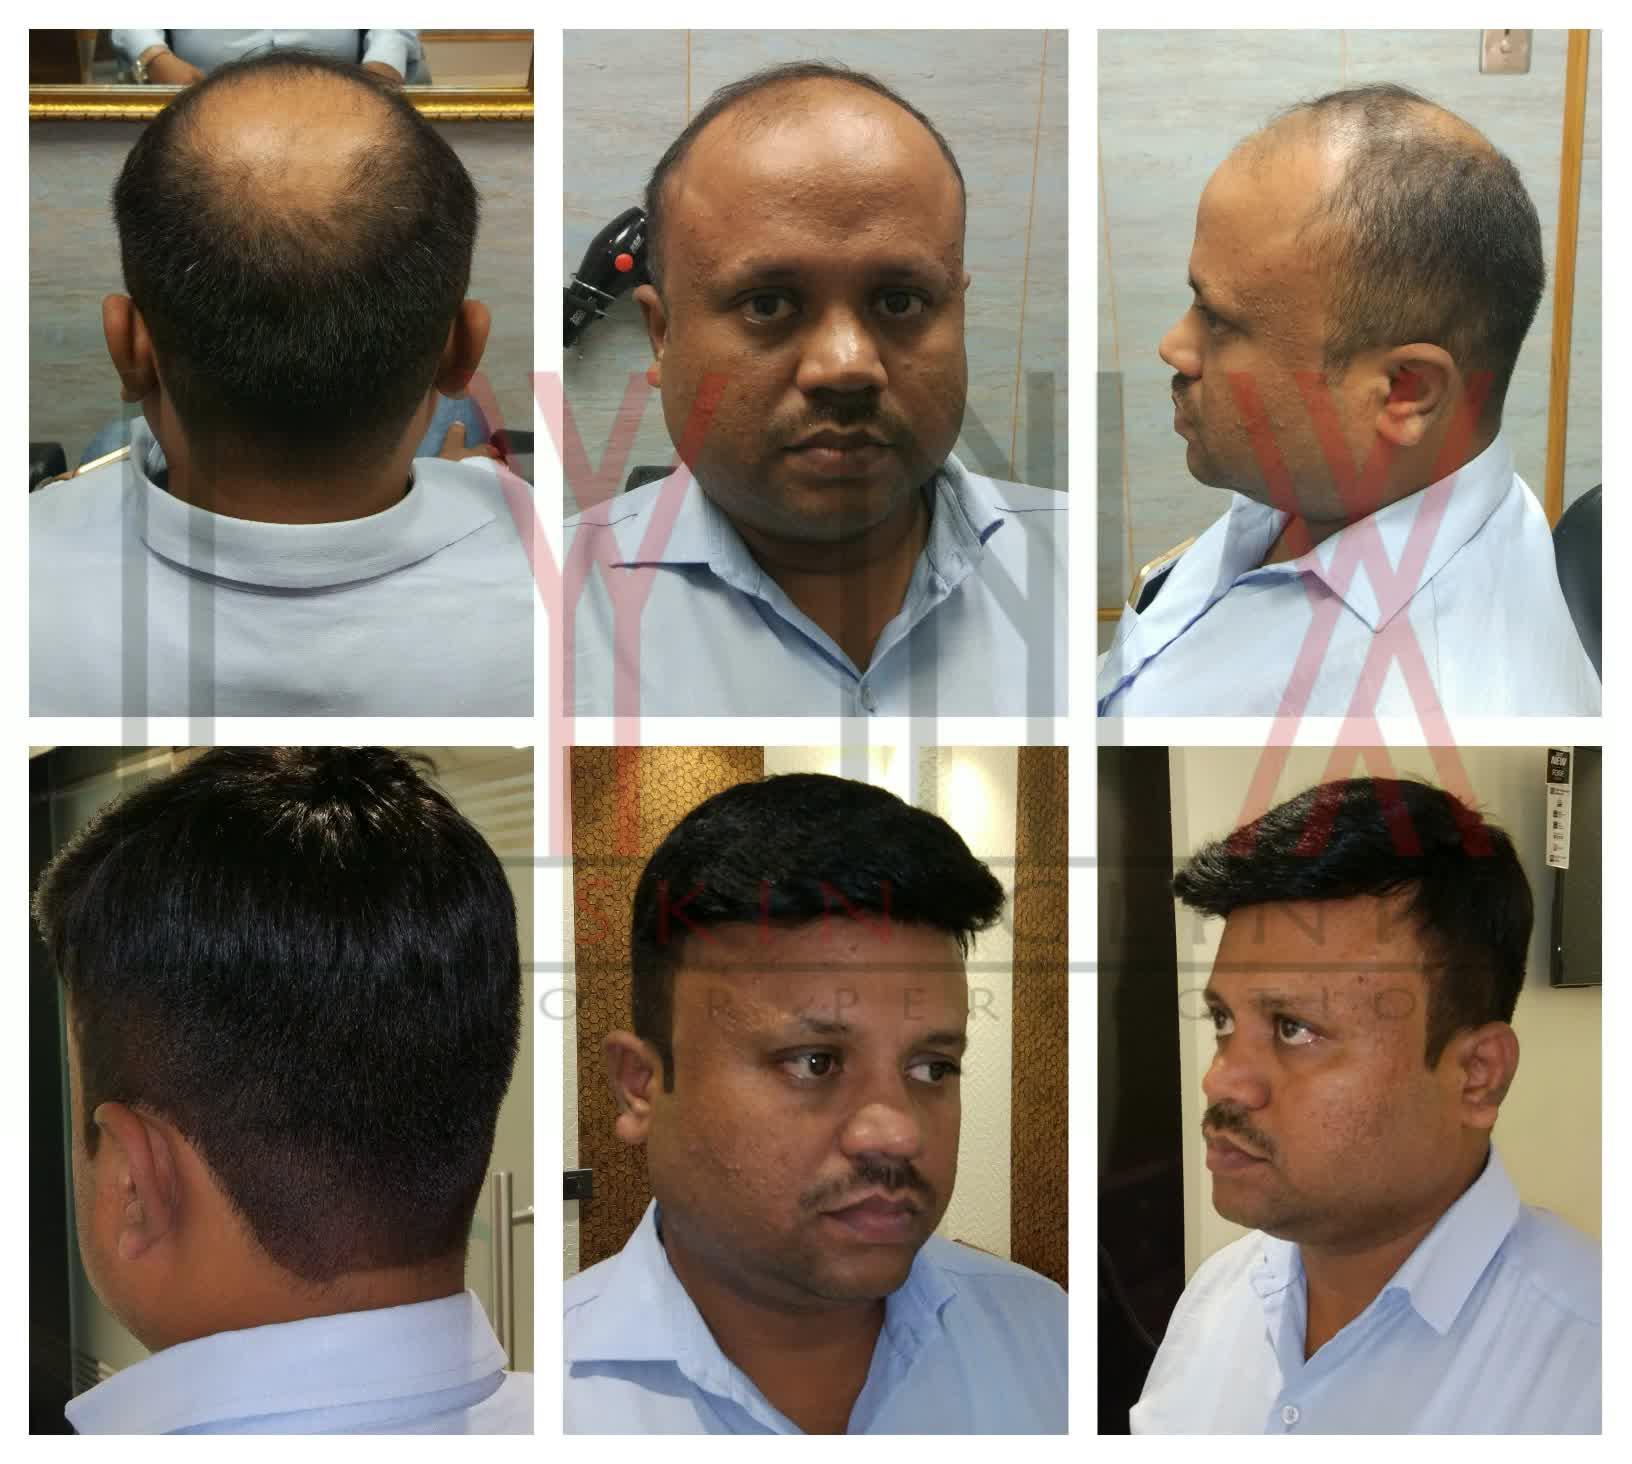 Hair Weaving in Gurgaon, Hair Weaving in Delhi, Hair Weaving in Jaipur, Best Weaving Hair in Gurgaon, Best Hair Weaving in Delhi, Best Hair Weaving in Jaipur, Non Surgical Hair Replacement in Gurgaon, Non Surgical Hair Replacement in Delhi, Non Surgical Hair Replacement in Jaipur